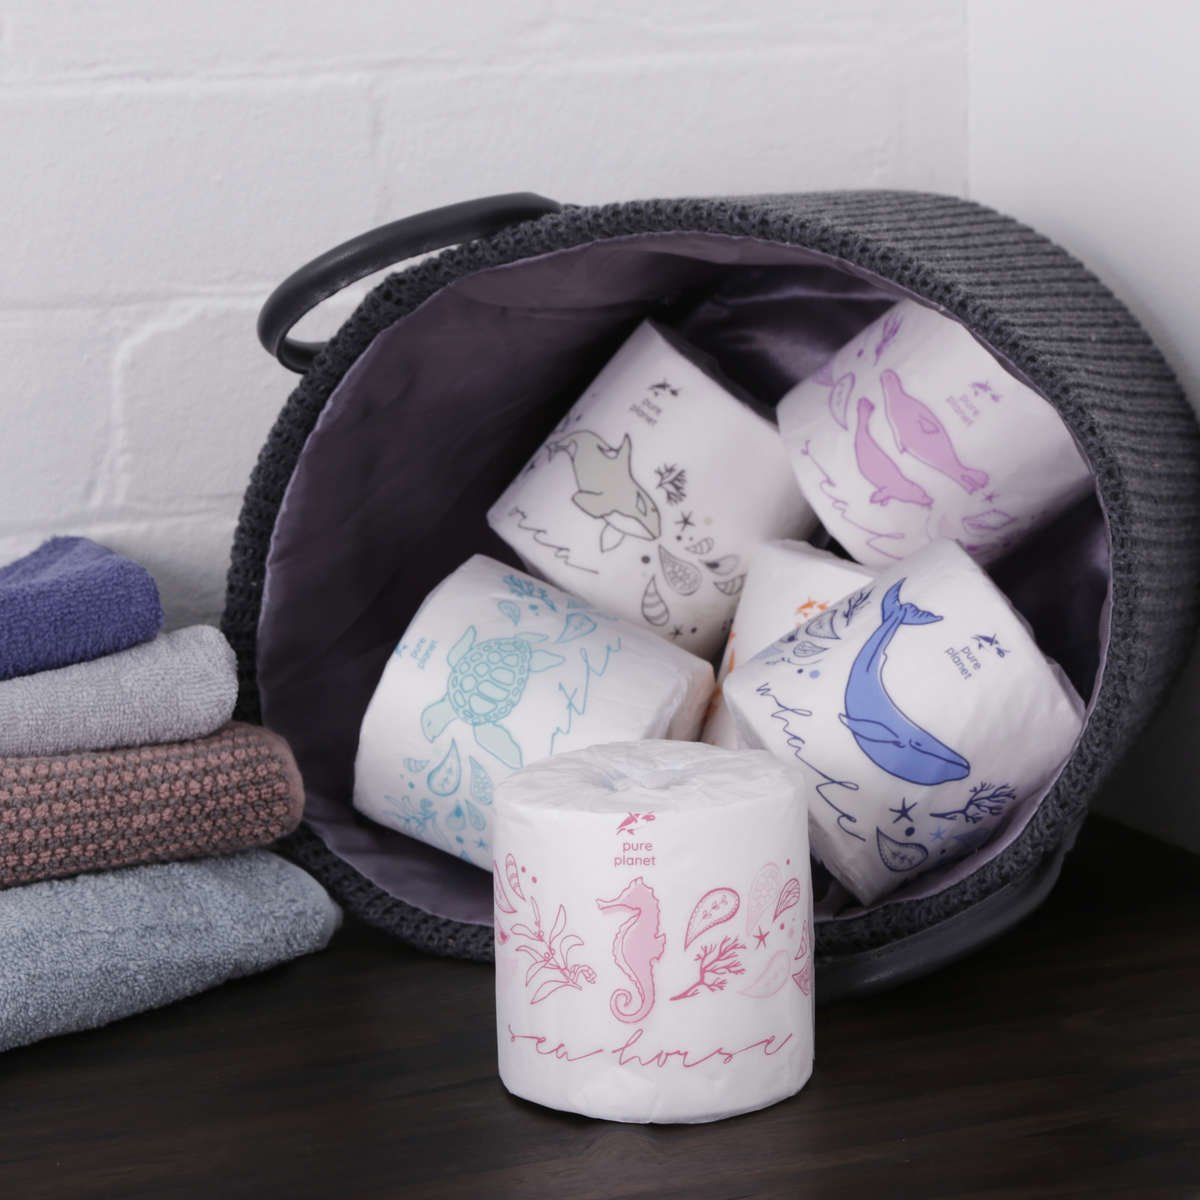 Pure Planet Tree-Free Toilet Tissue Rolls